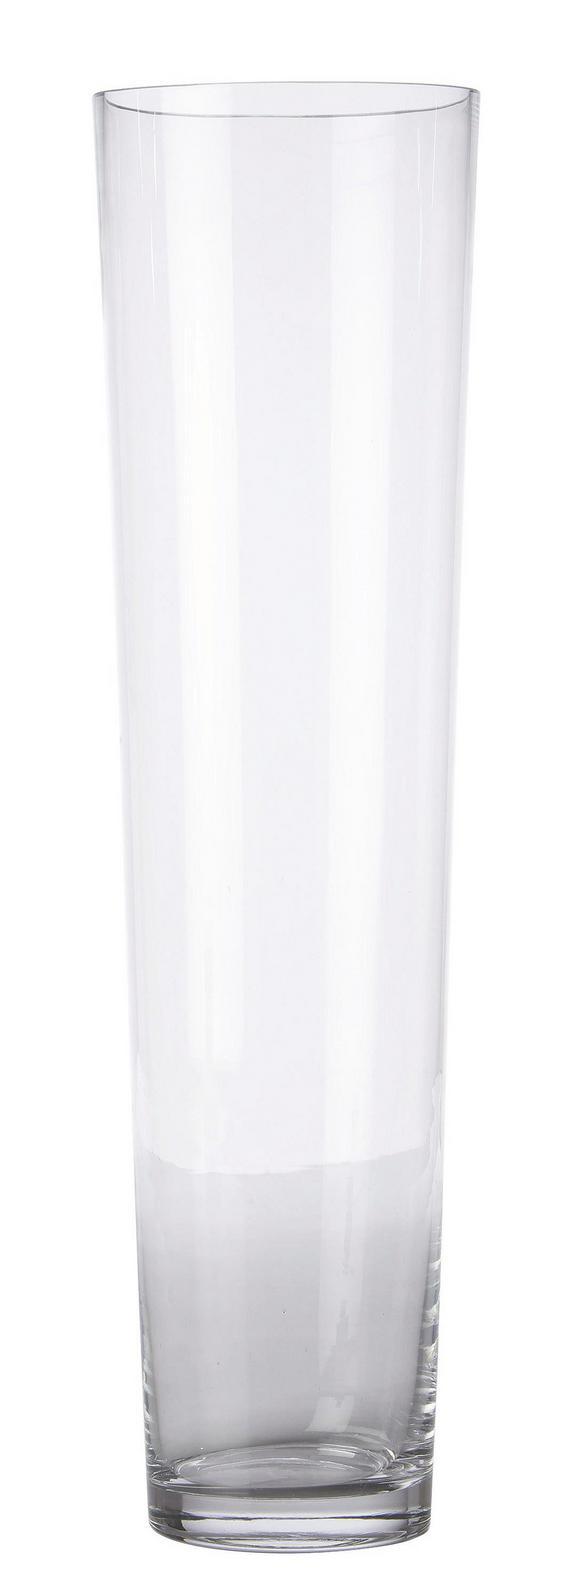 Vaza Andrea - prozorna, Moderno, steklo (19/70cm) - MÖMAX modern living